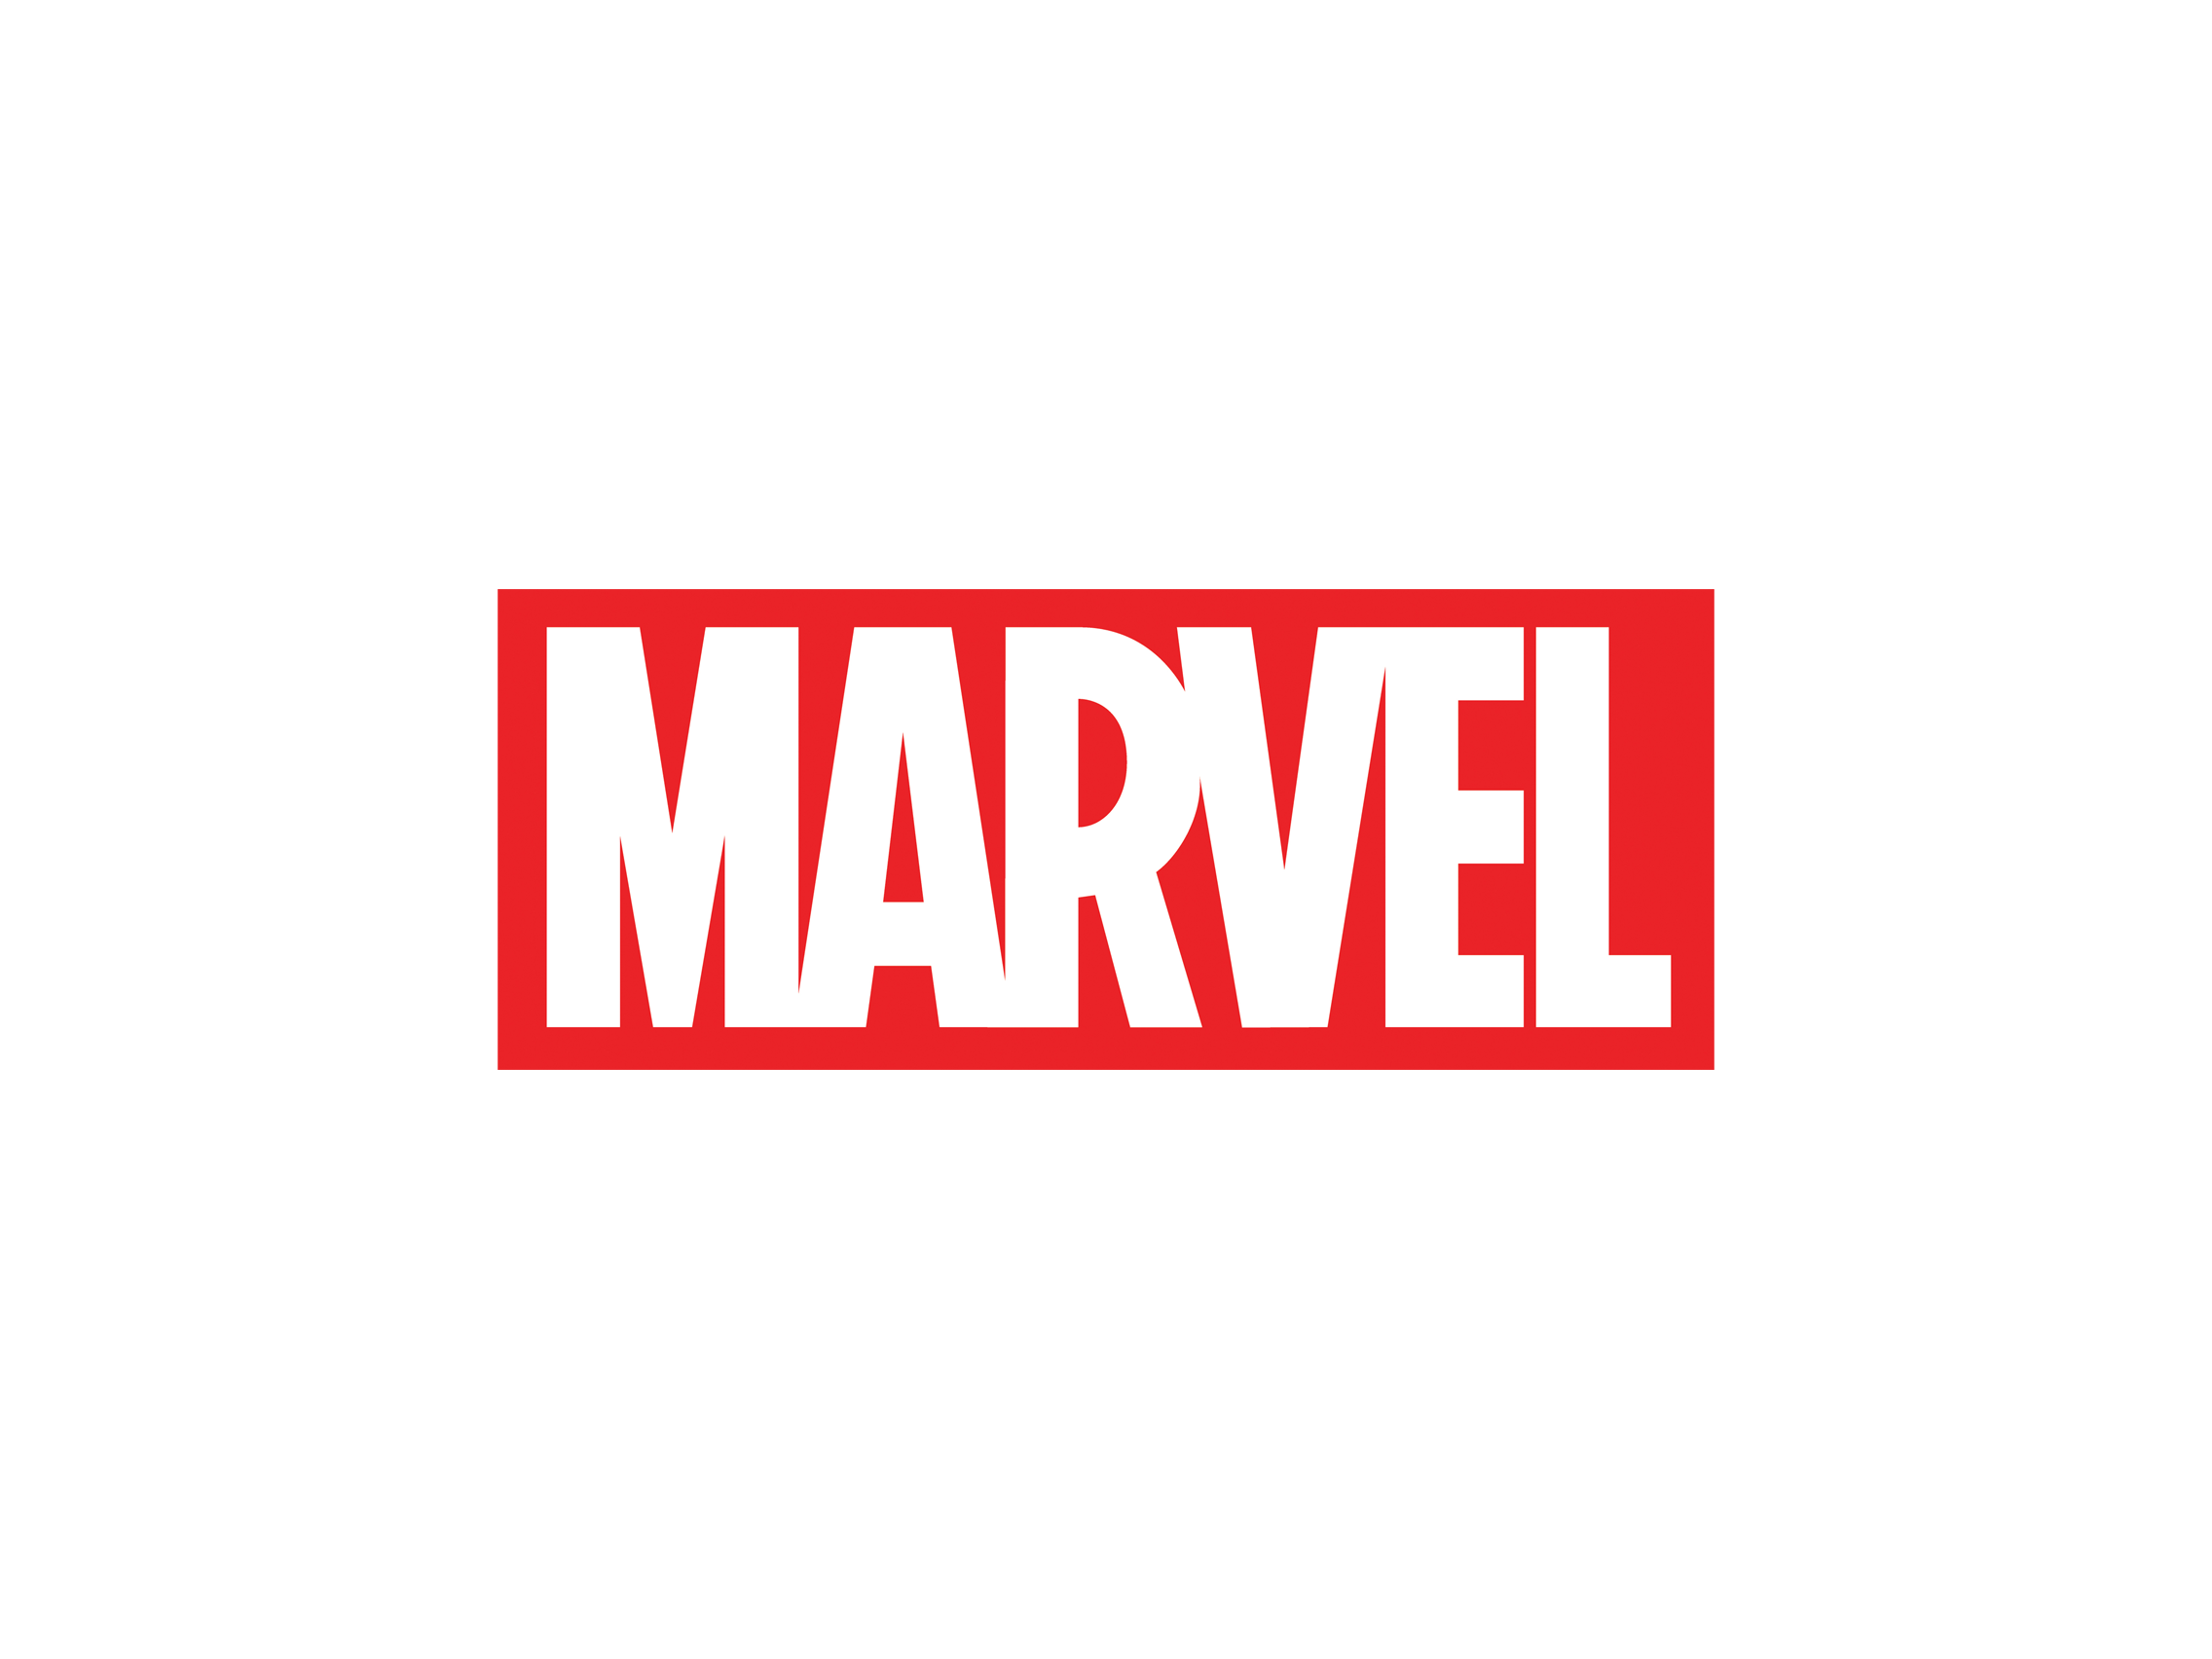 Pin by eder gomez on Marvel Marvel logo, Marvel tattoos